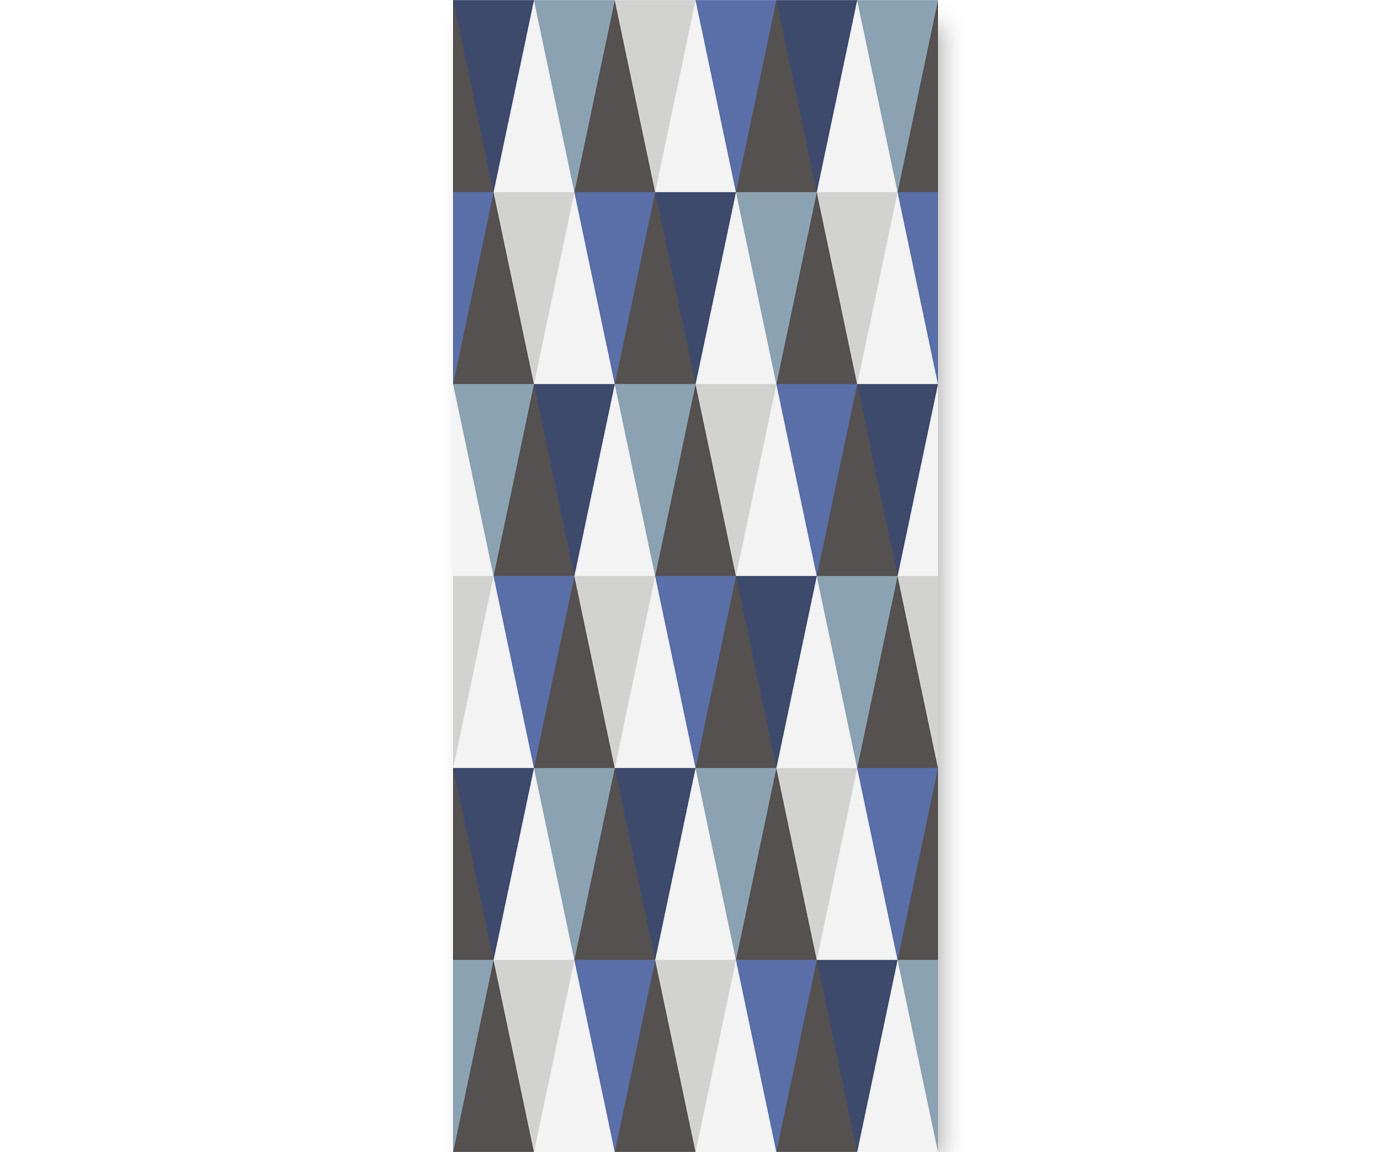 tapeta dla dzieci hexagons long blue